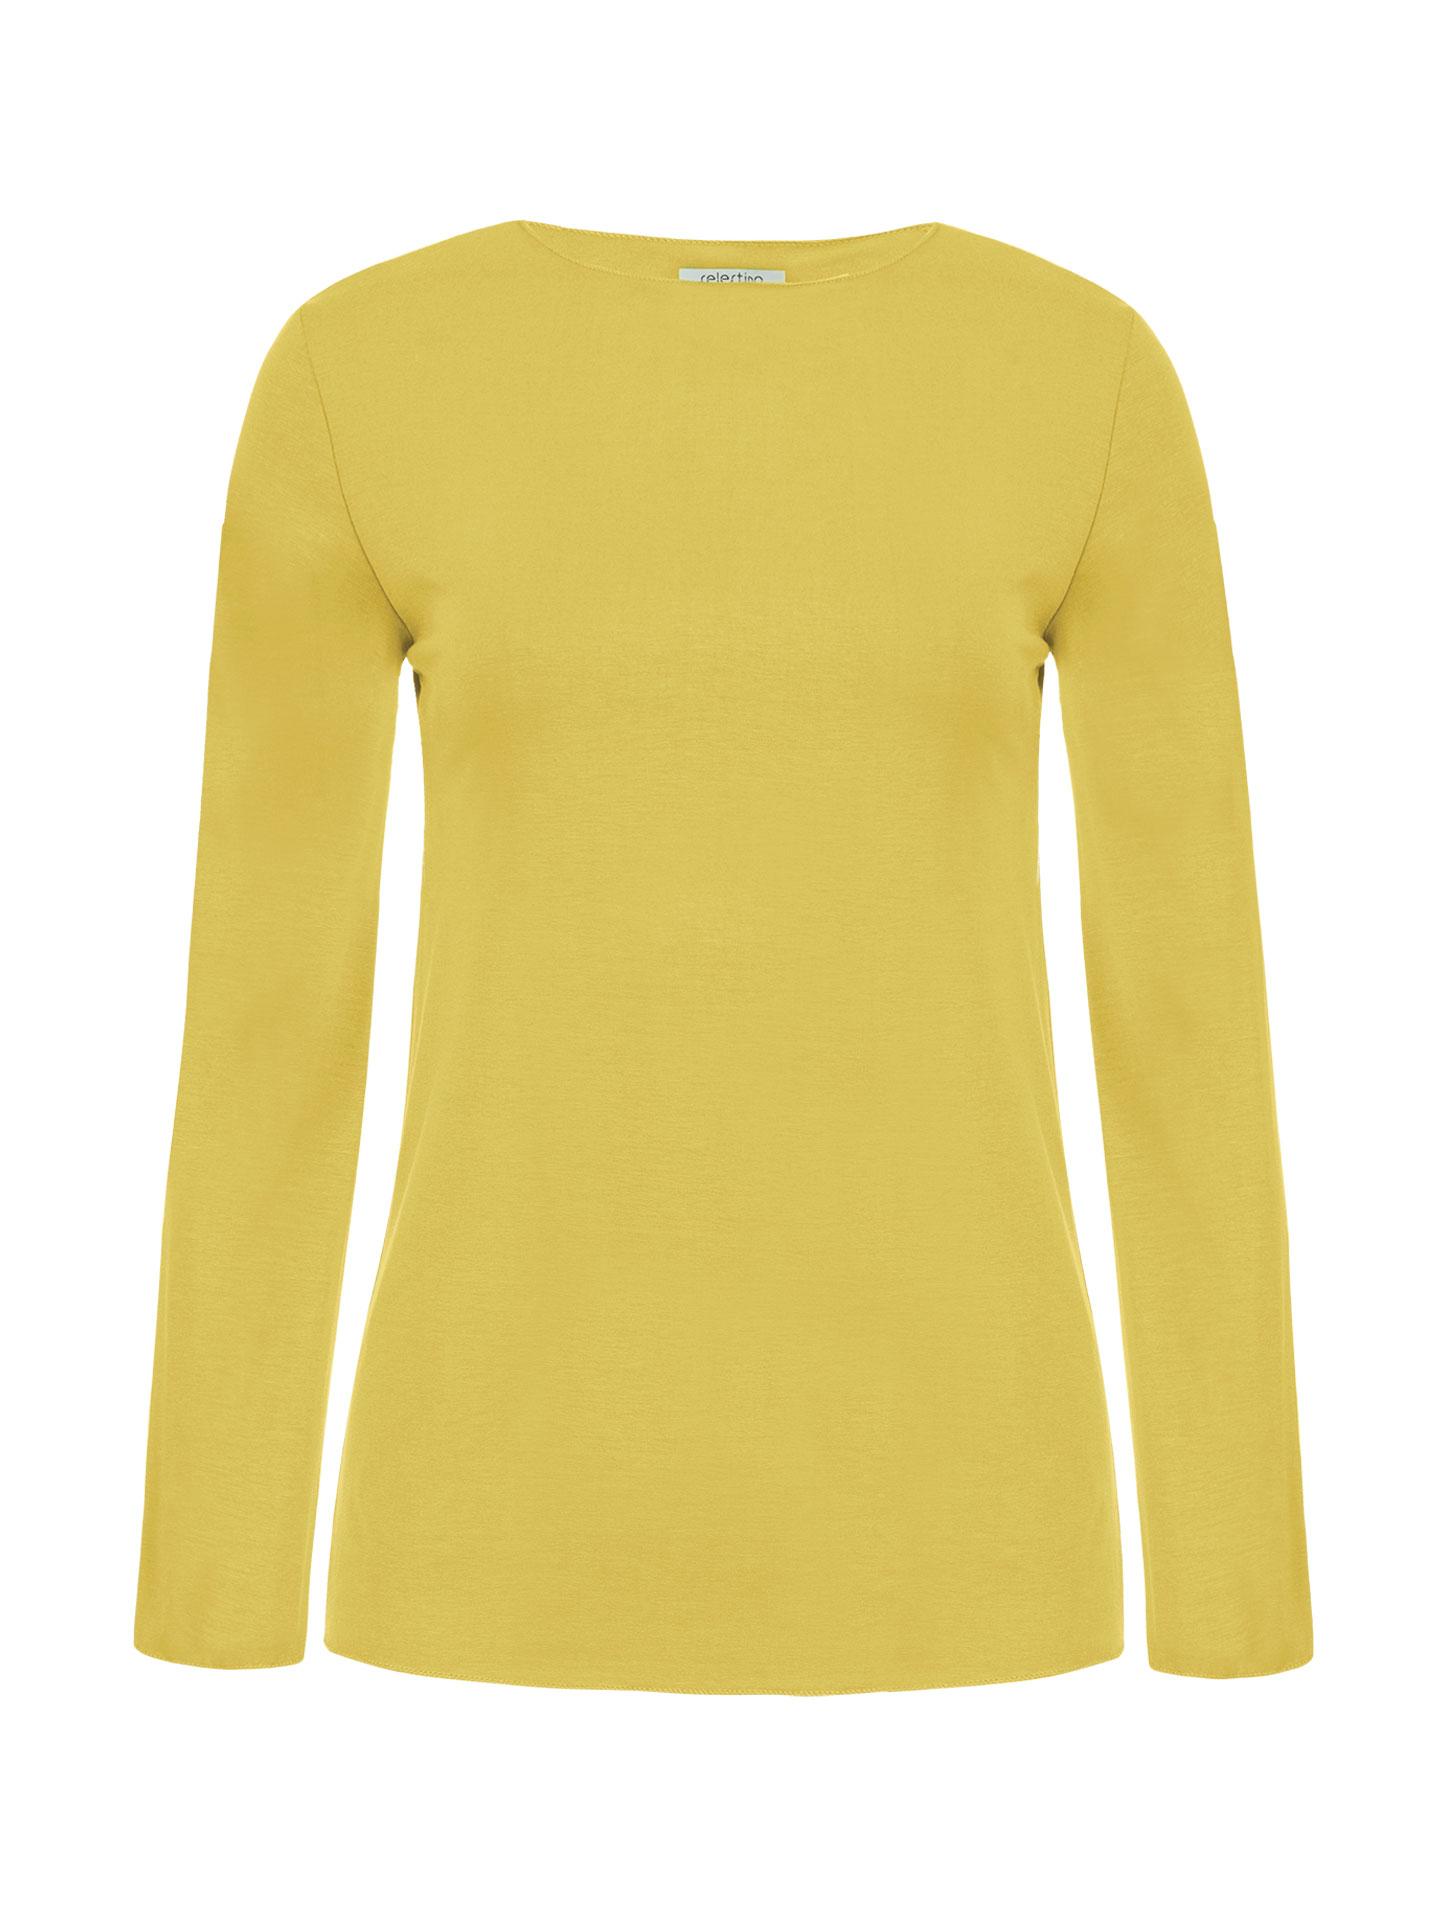 ab6a9bd3a886 Μακρυμάνικη μπλούζα σε κιτρινο